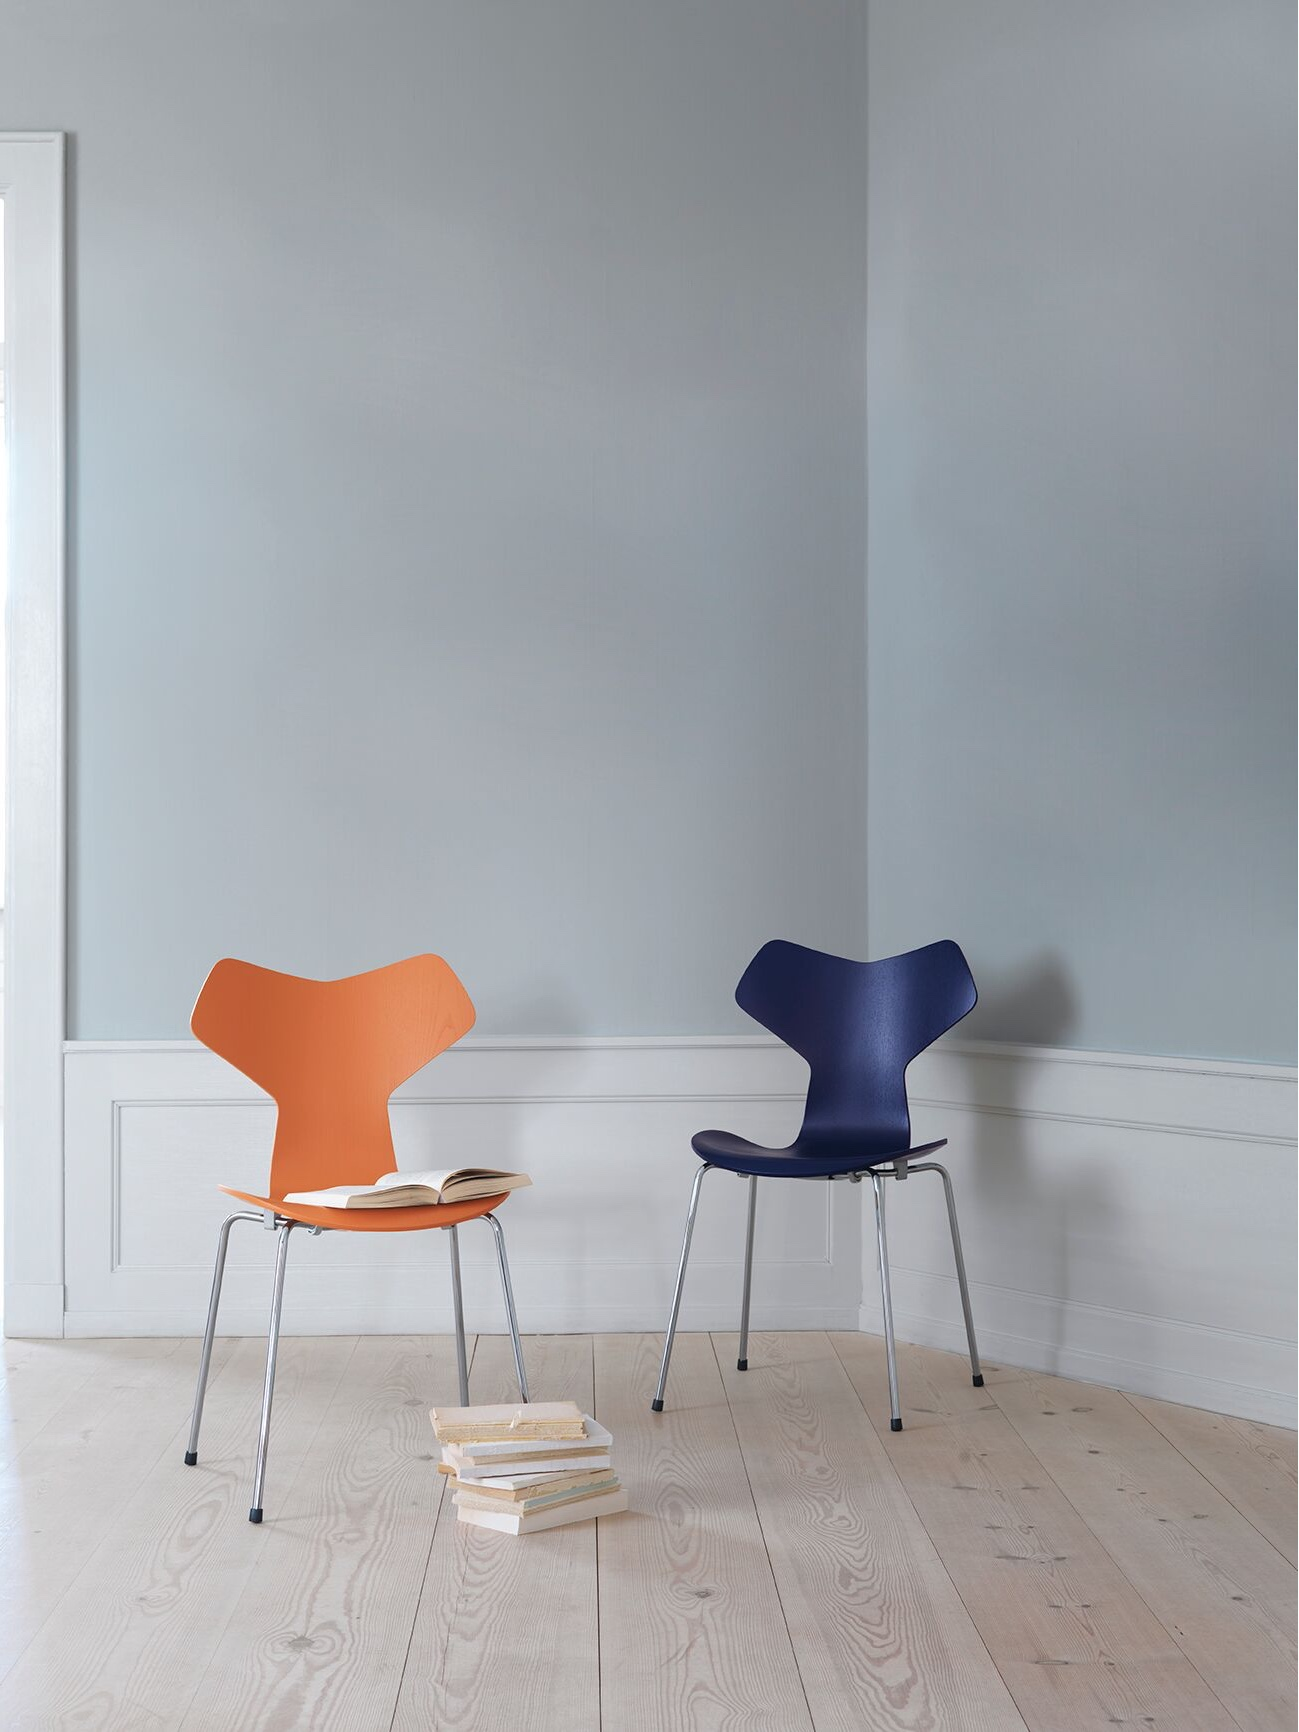 Grand Prix™ inChevalier Orange and Ai Blue. Colours by Danish artist Tal R.